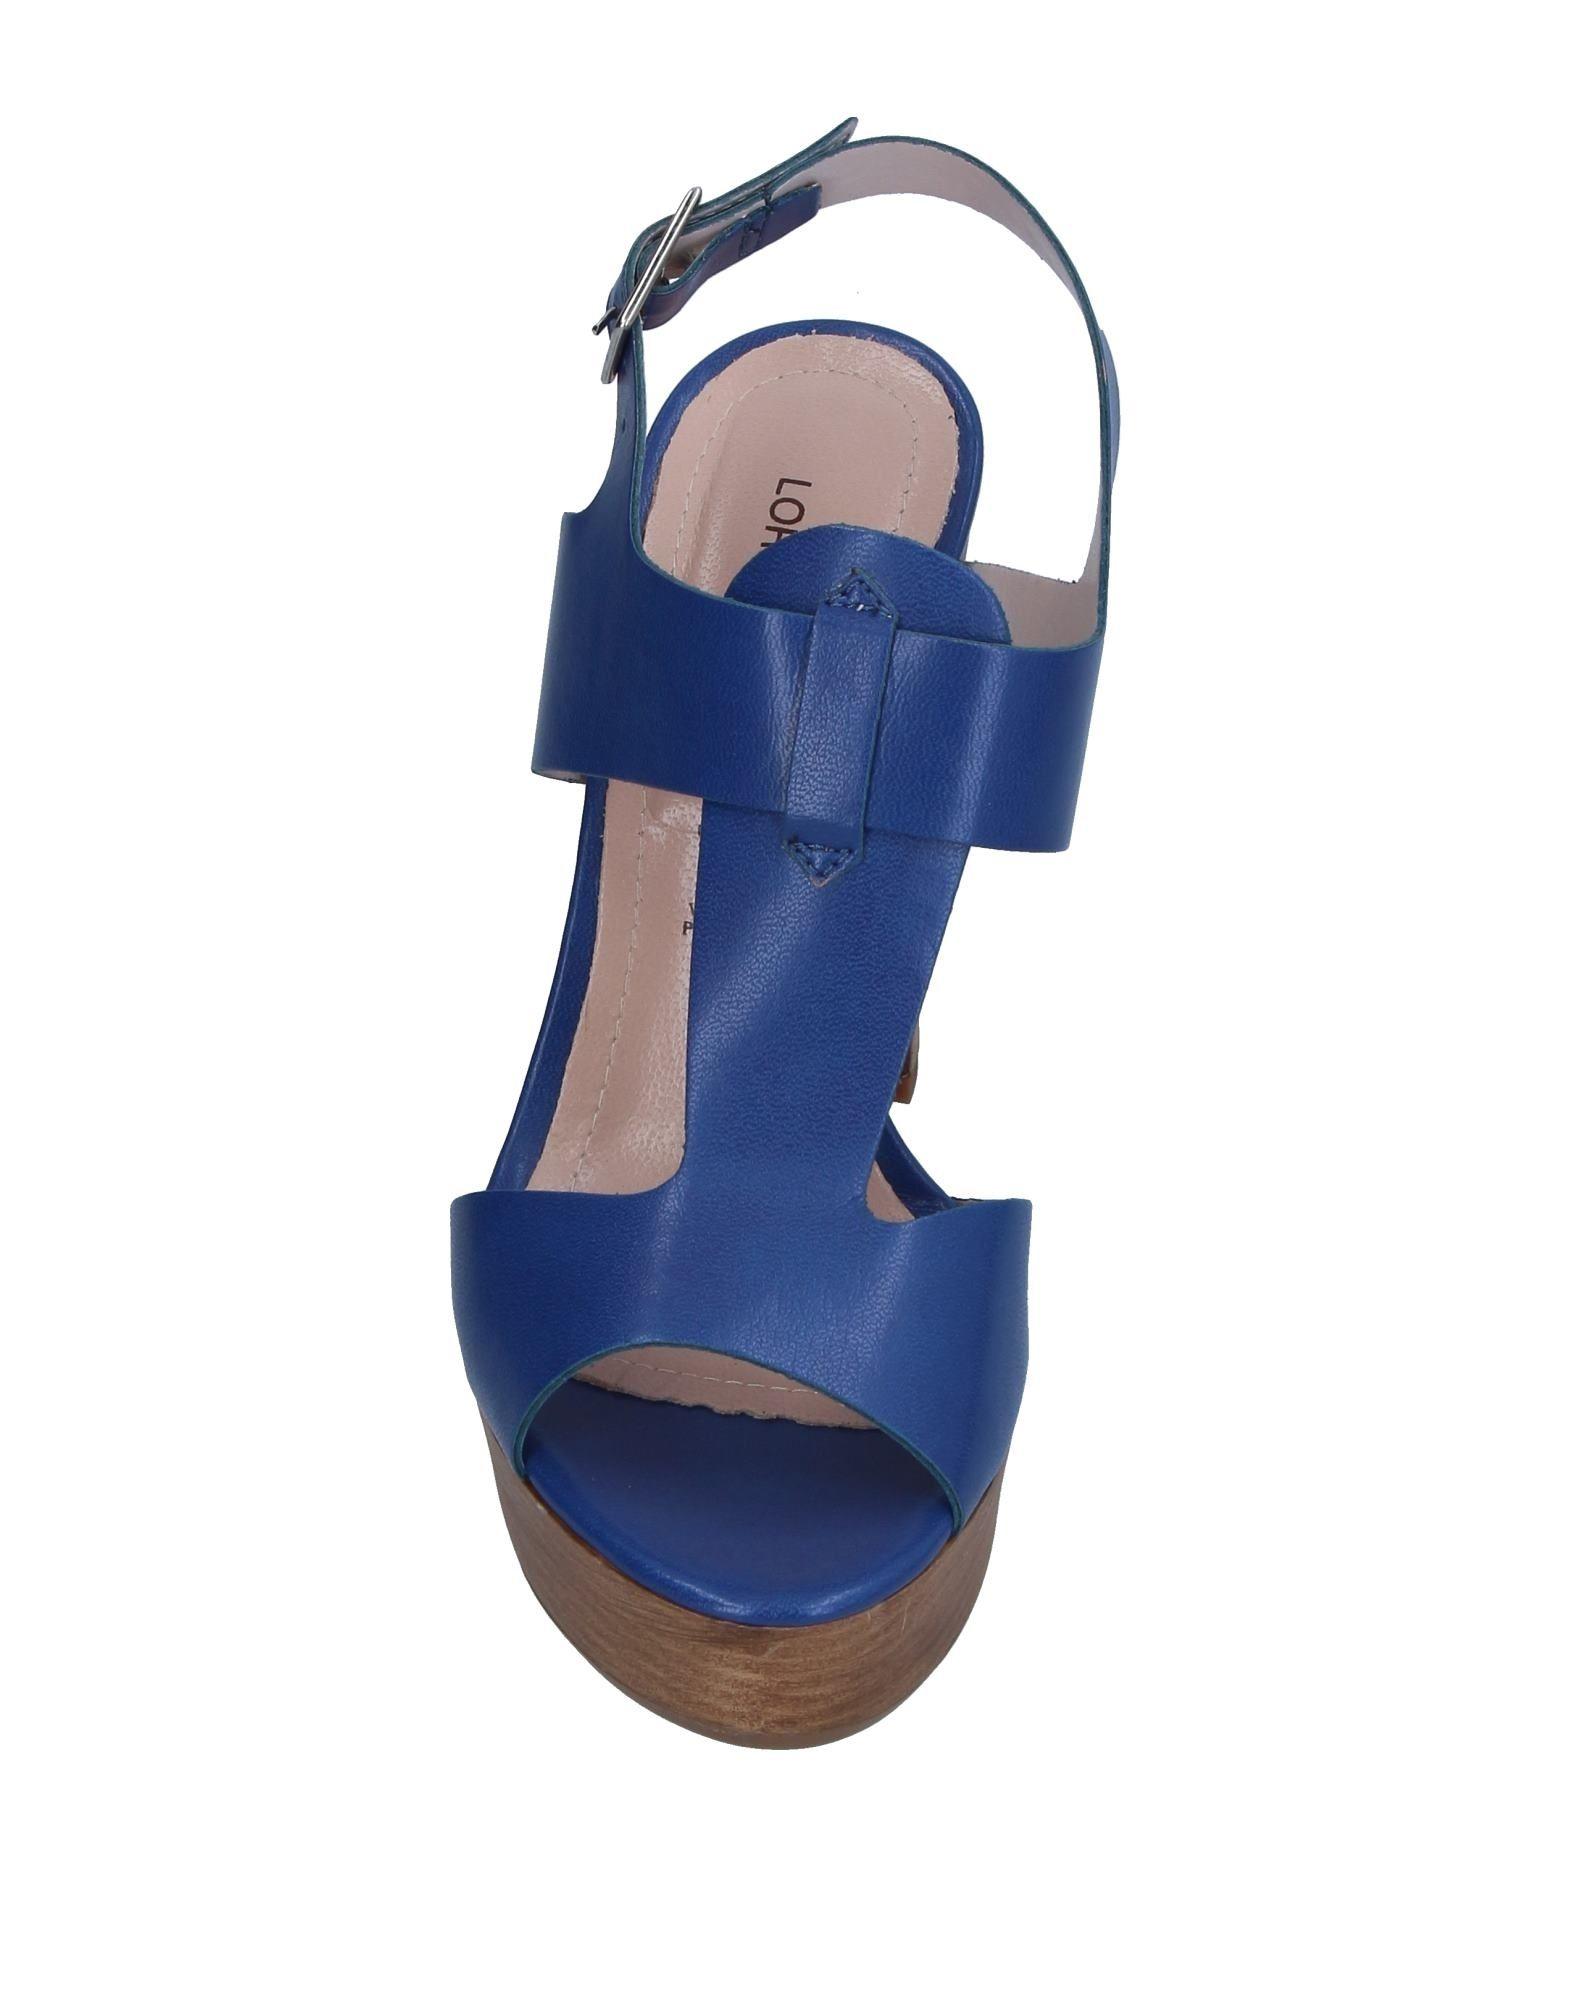 lorenzo lorenzo lorenzo mari sandales - femmes lorenzo mari sandales en ligne le royaume - uni - 11367107ej a25141